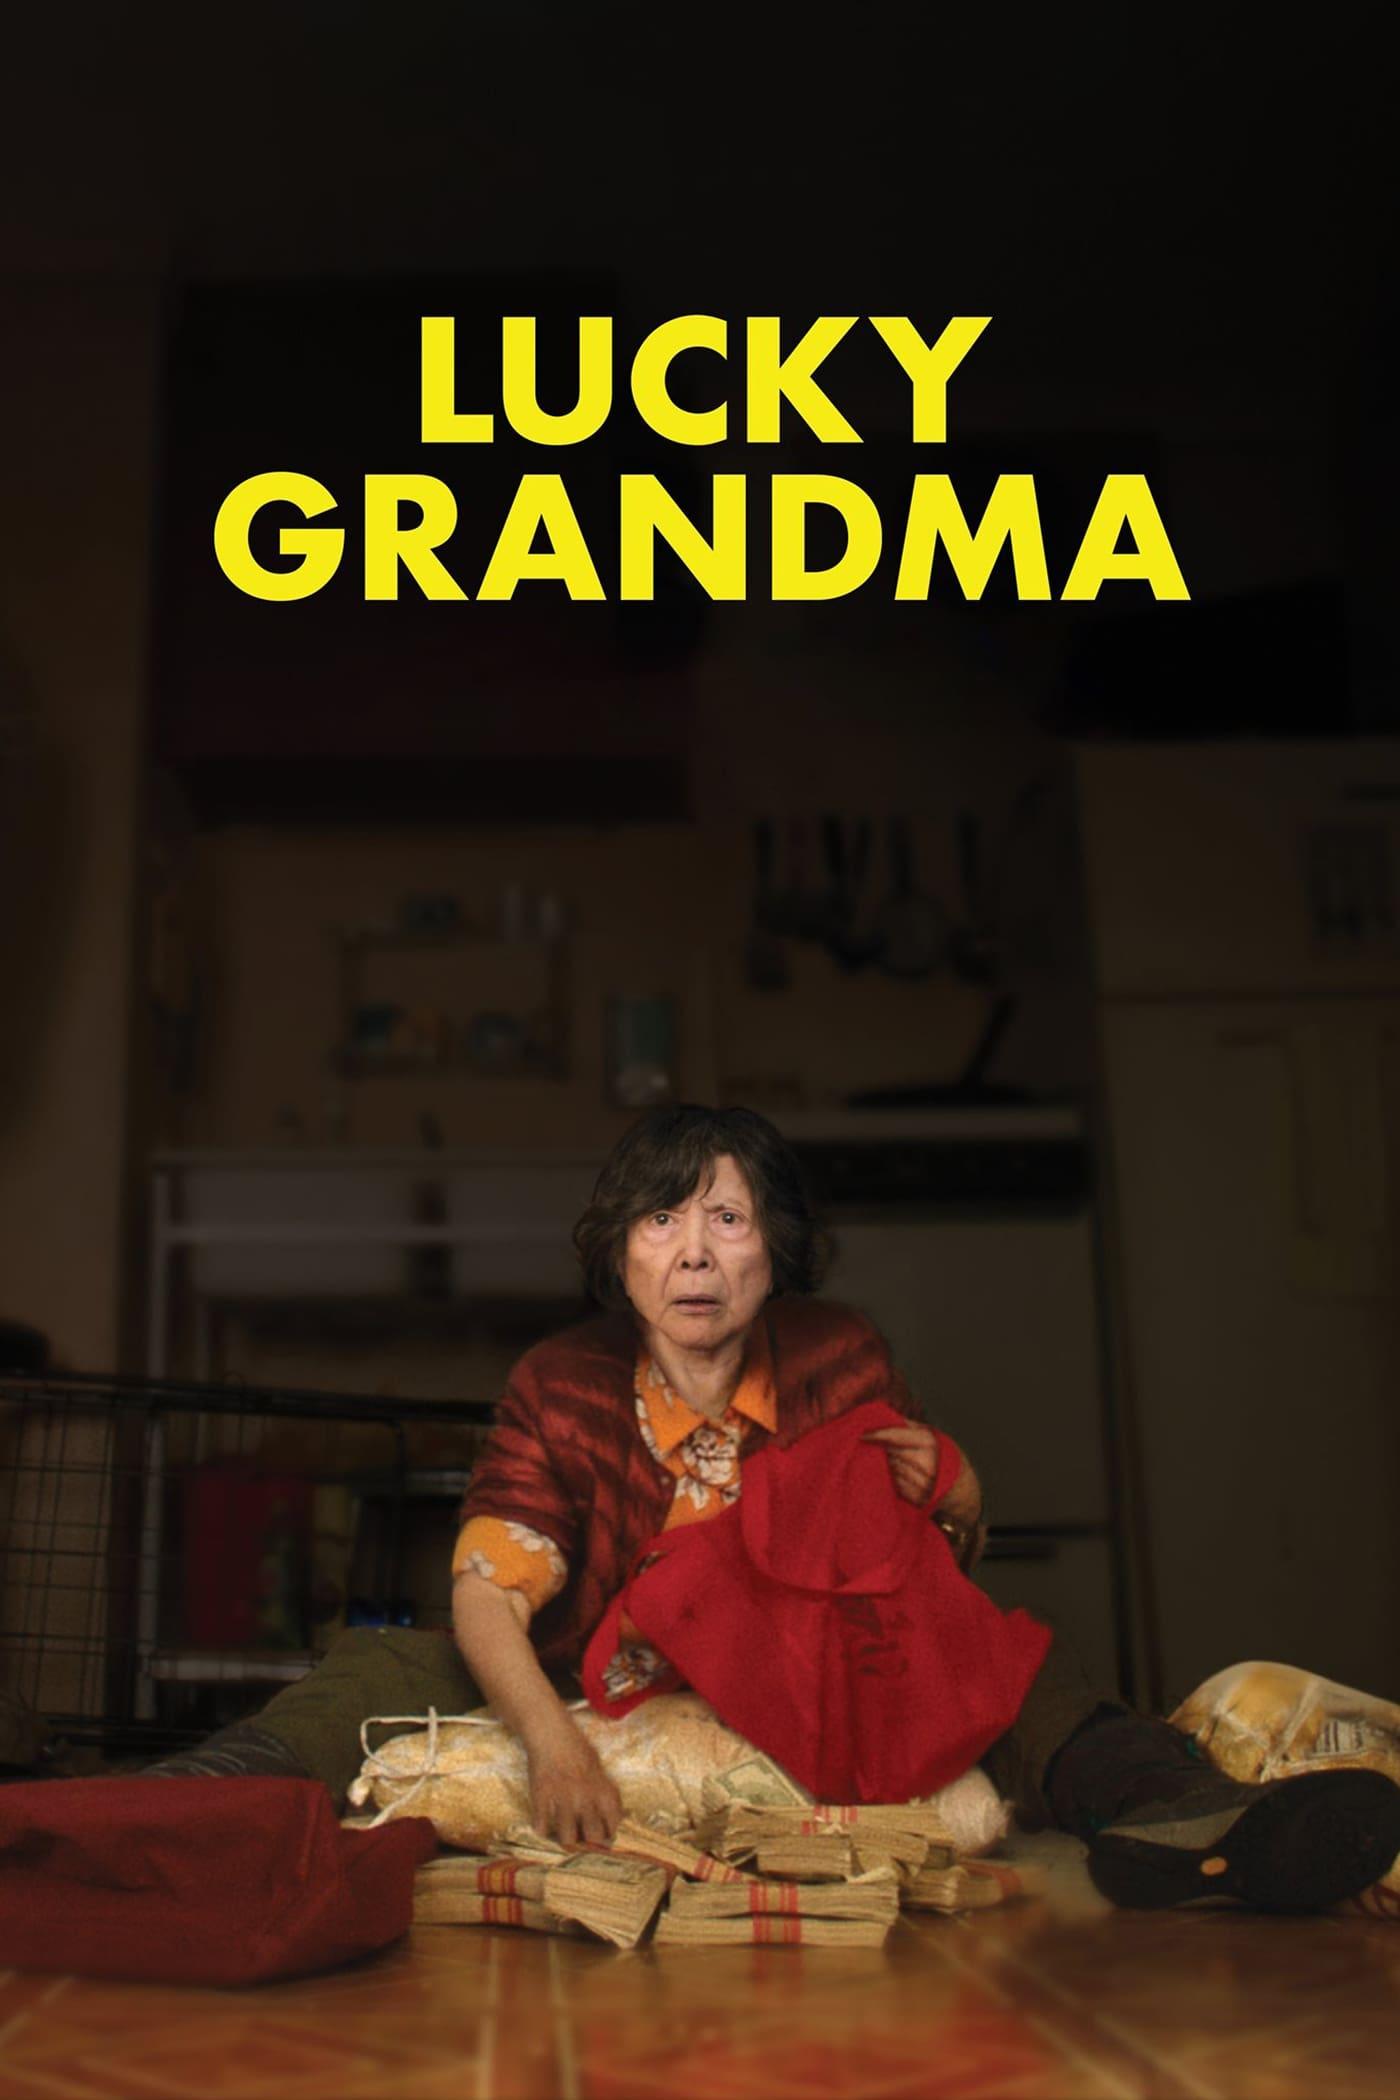 Poster for Lucky Grandma